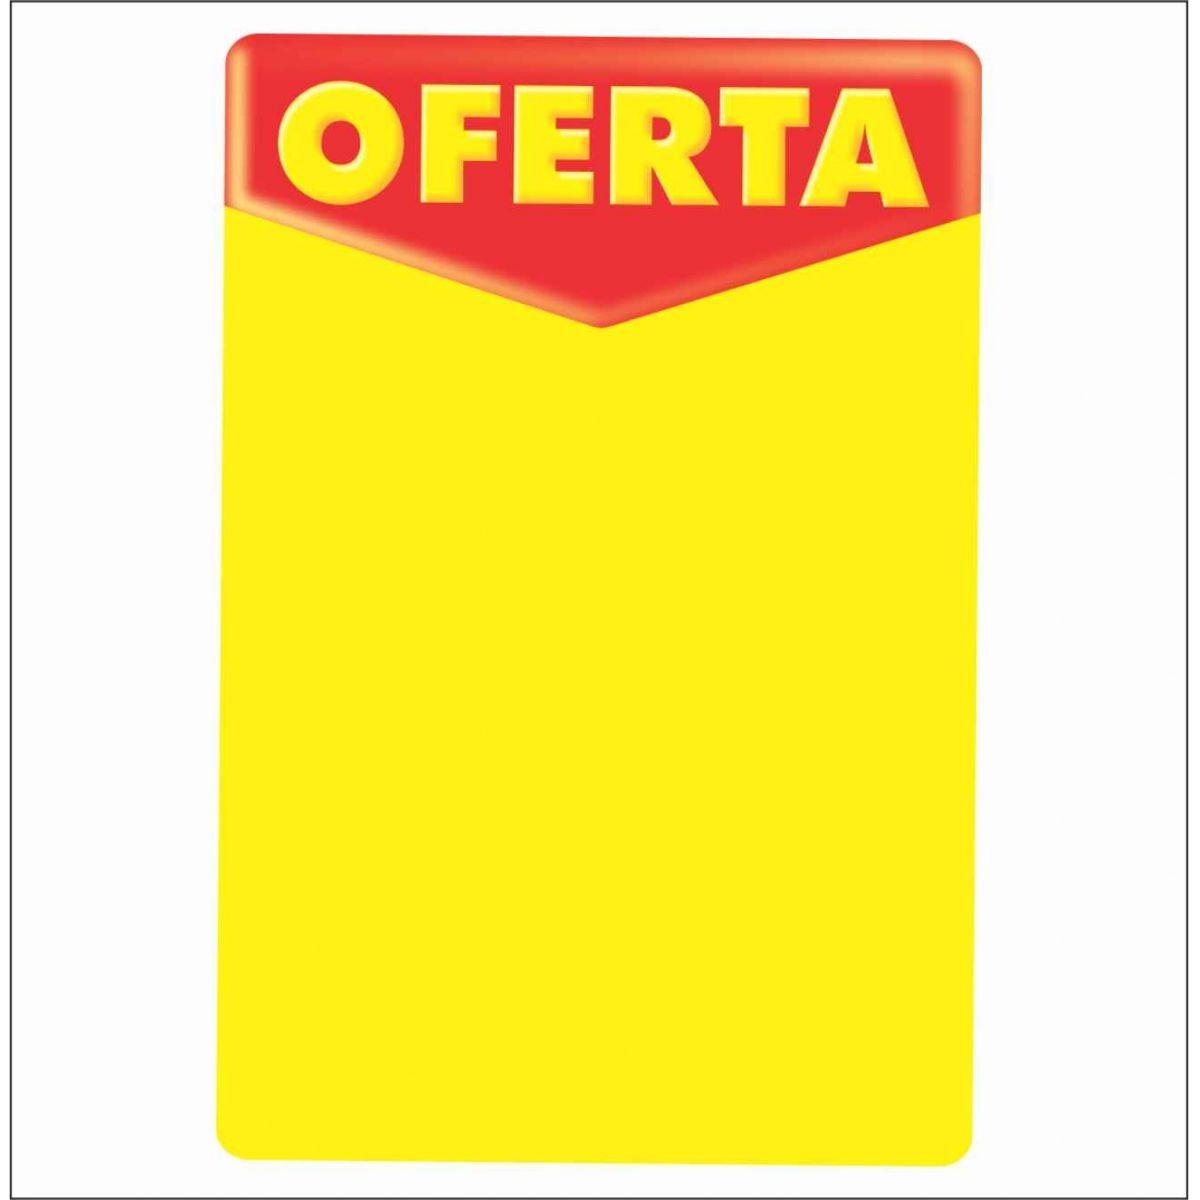 CARTAZ OFERTA 62X92CM (C/100 UNIDADES, BIG)